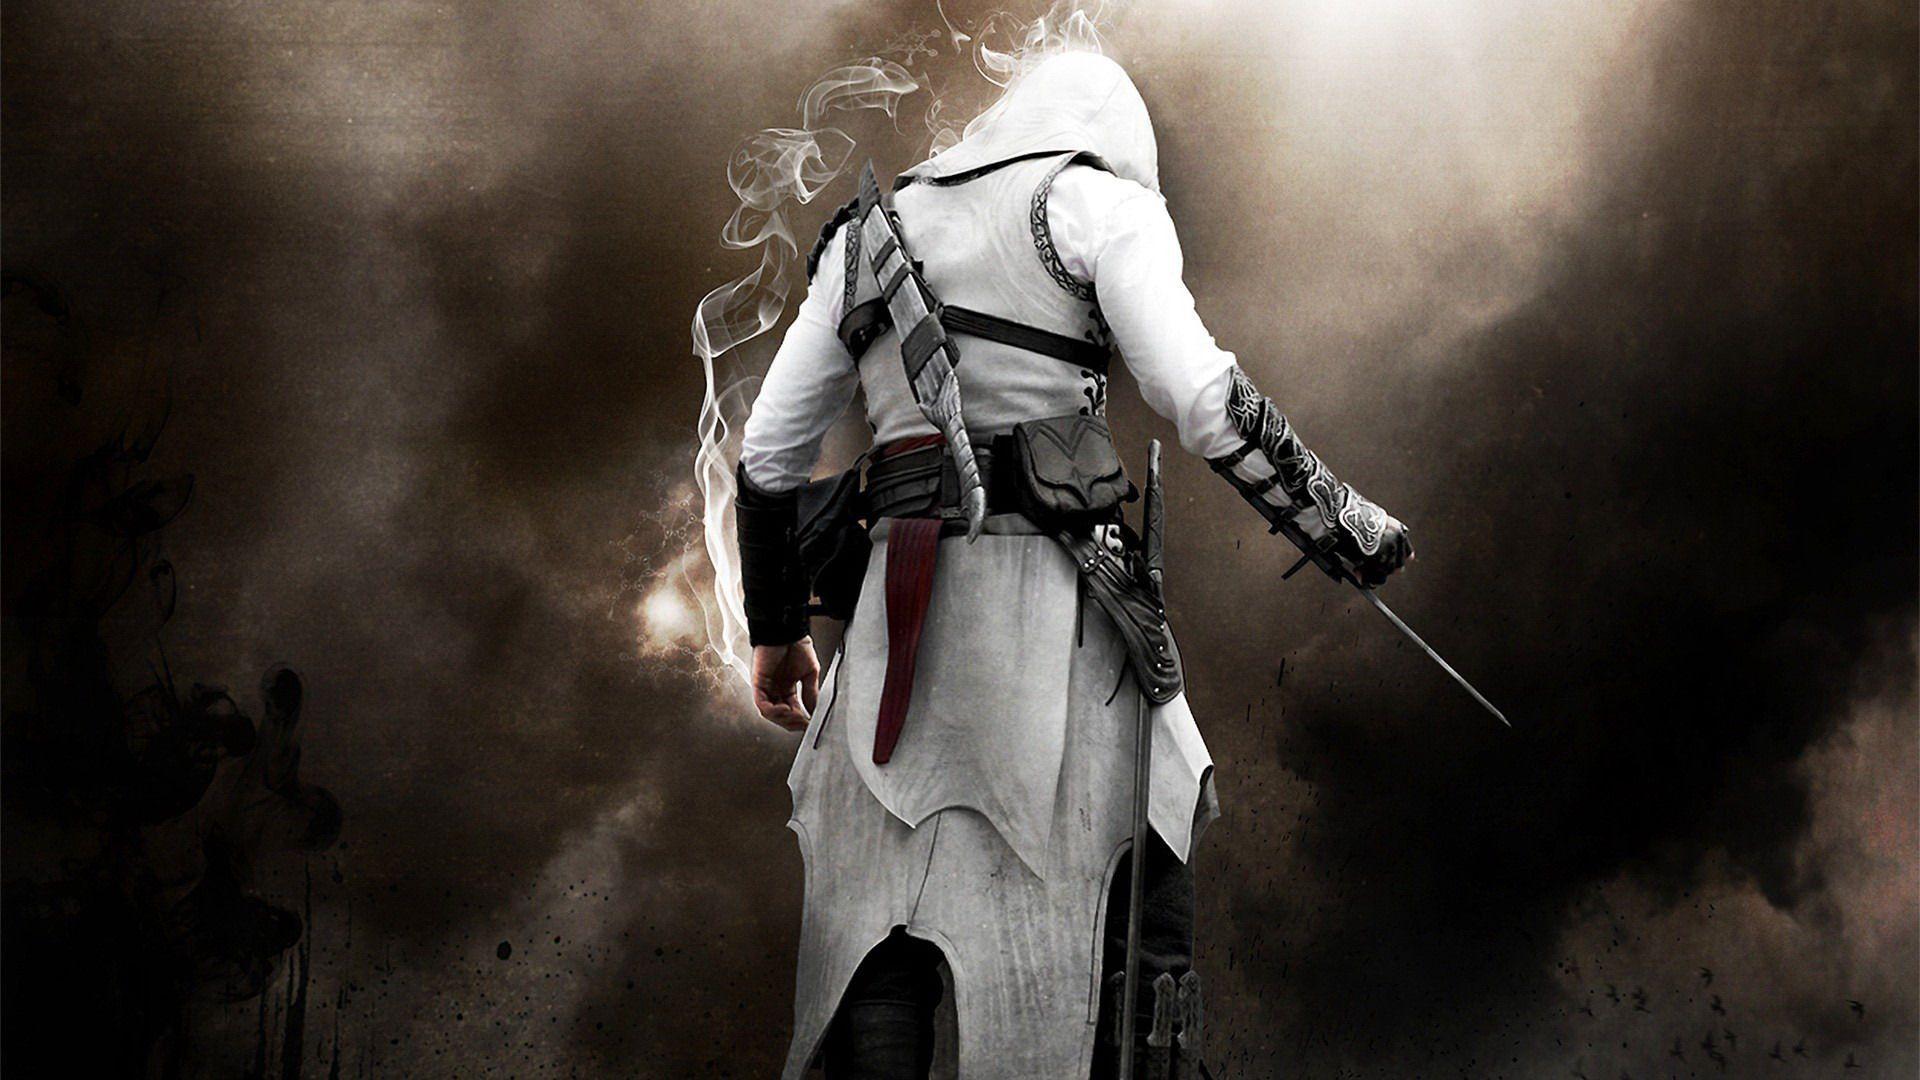 Assassins Creed Wallpapers HD Wallpaper 1191×670 Assassin